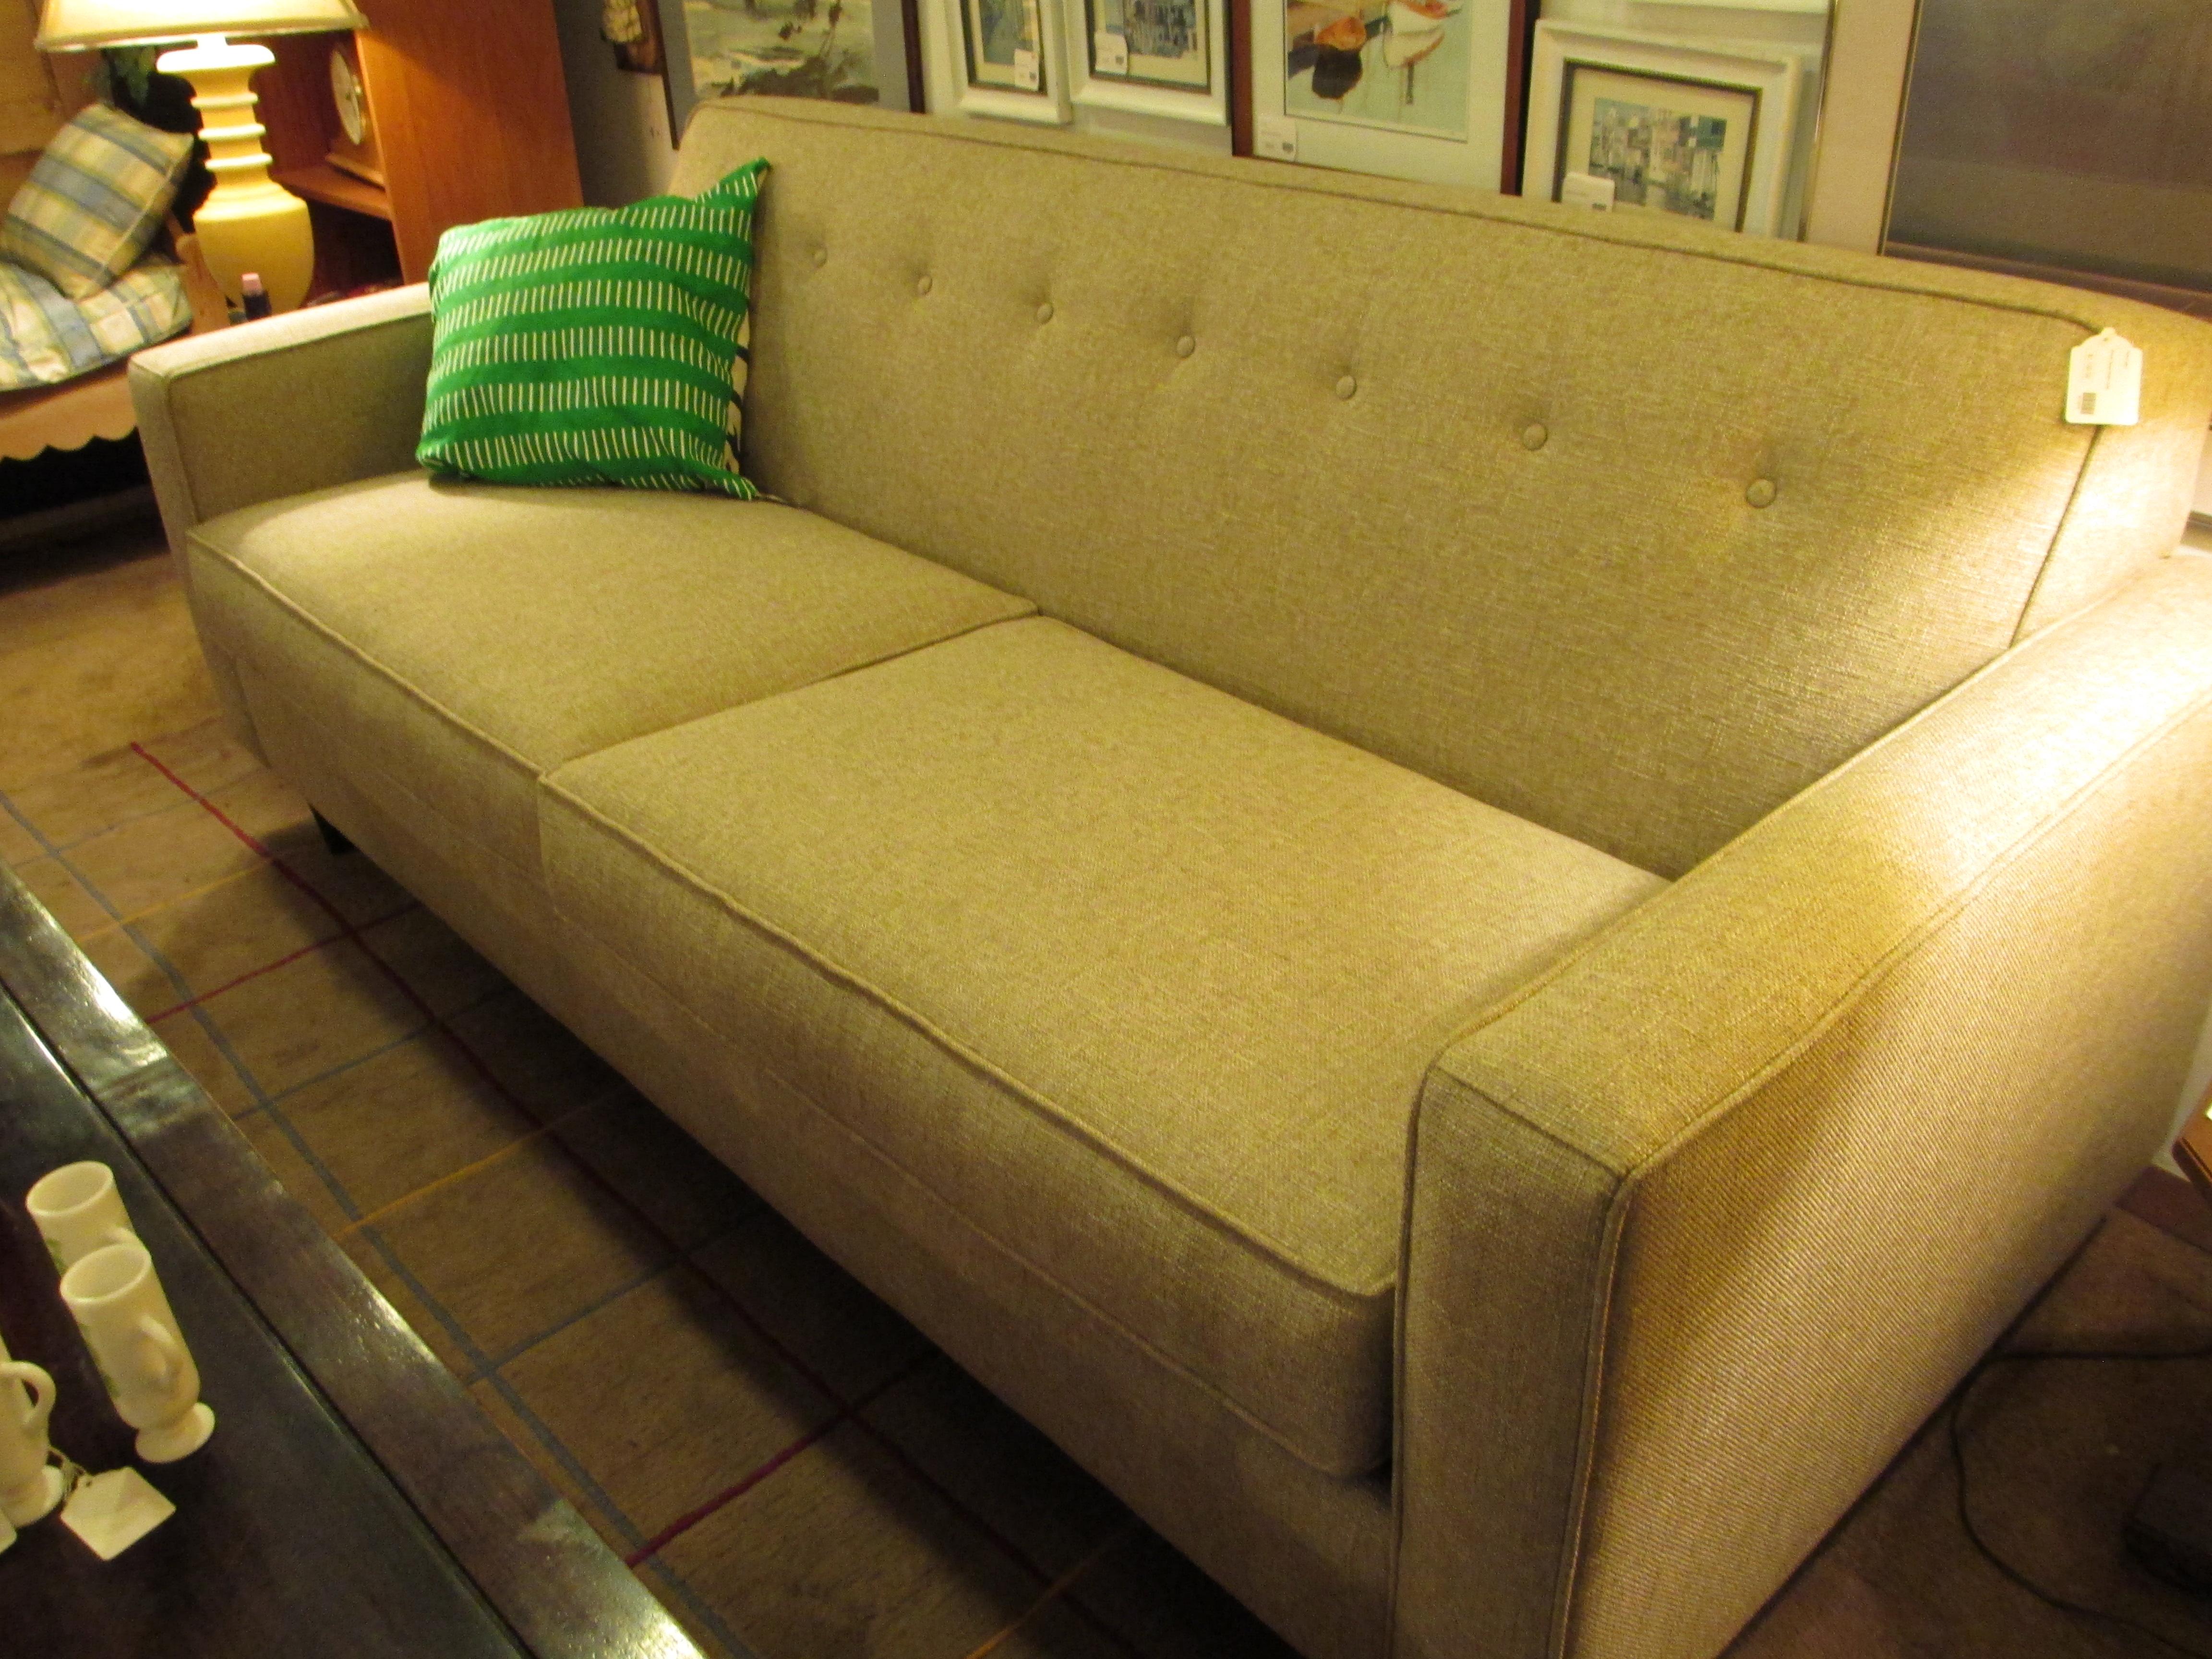 Biltwell Taupe Tufted Modern Sofa – $1200 – Ballard